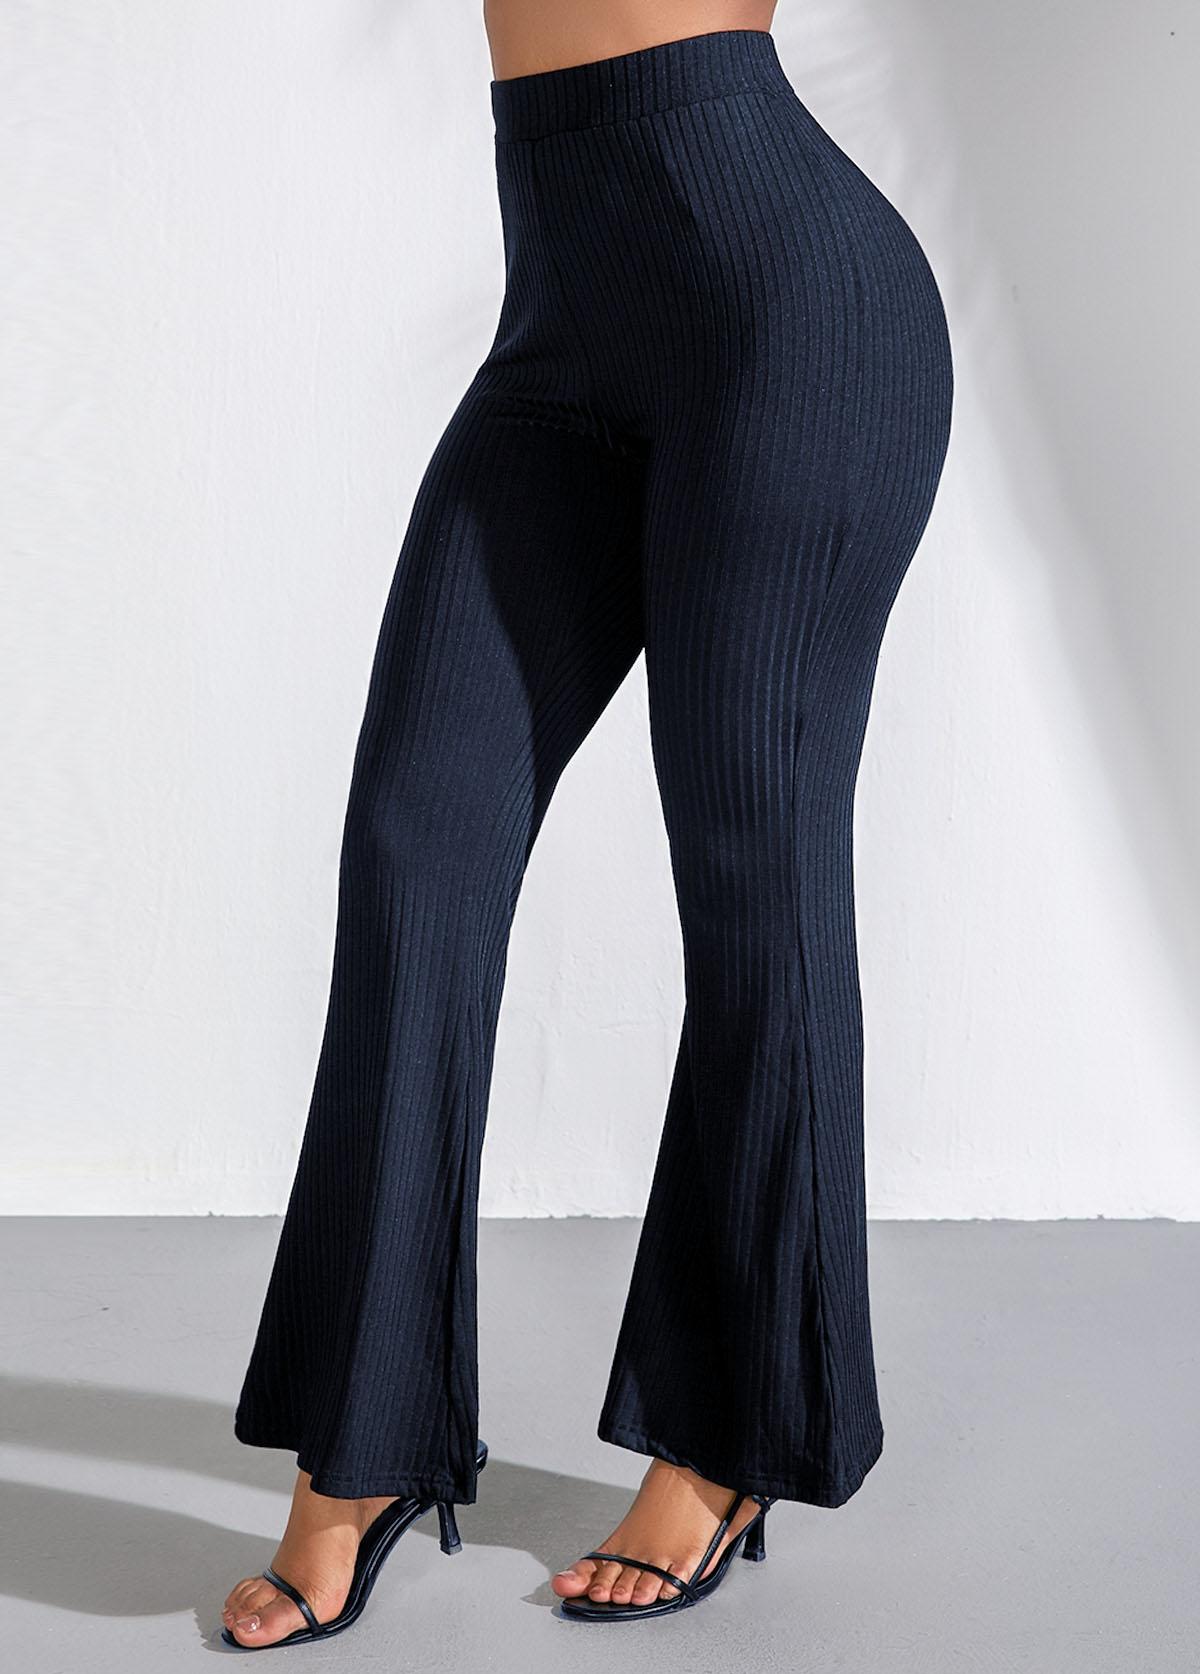 Elastic Waist Navy Blue Flare Pants